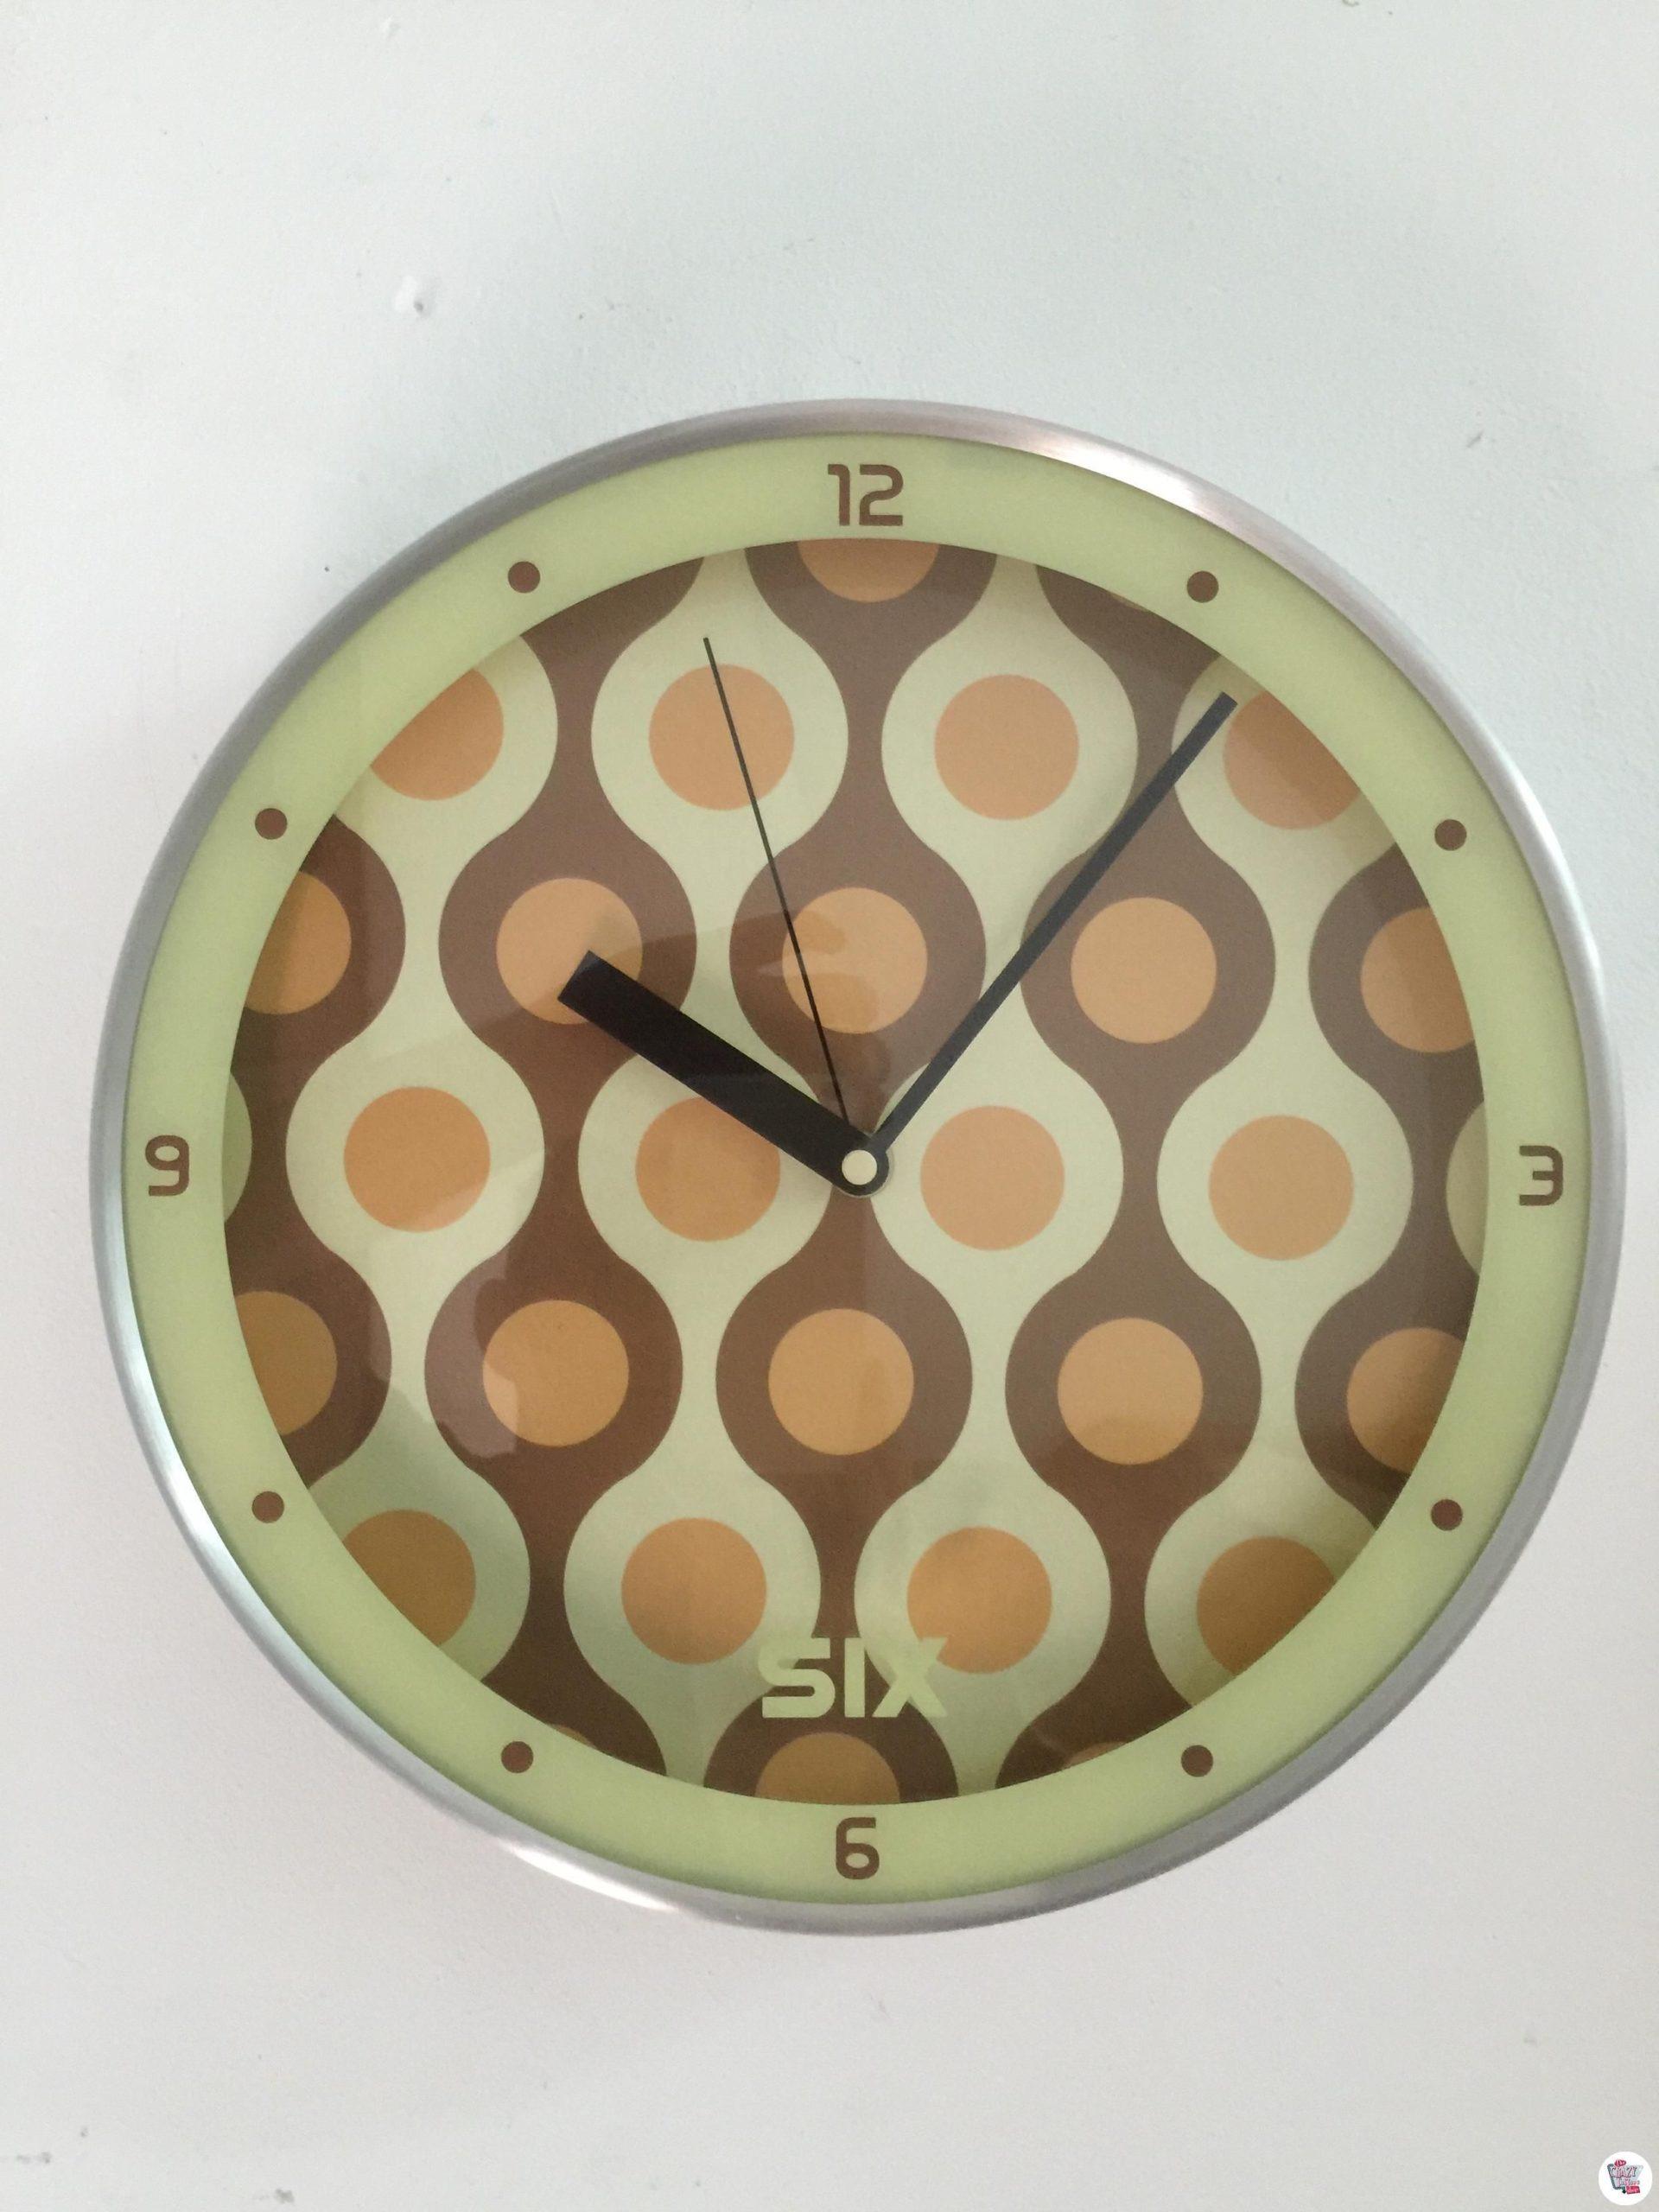 Retro Kitchen Clock 50s Spheres Thecrazyfifties Es